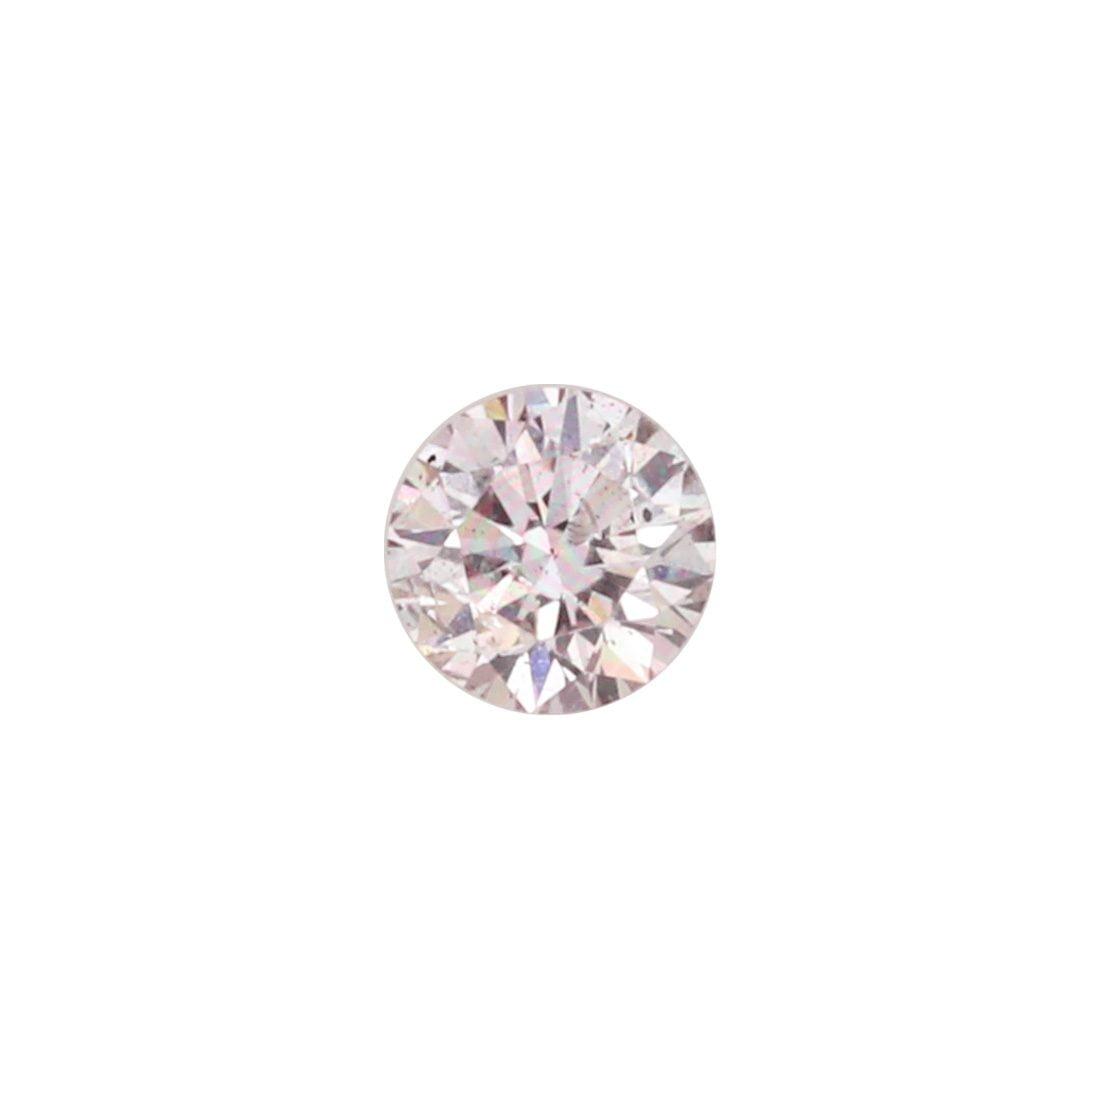 0.19ct Natural Fancy Light Pink, 8P, SI2, Argyle Pink Diamond